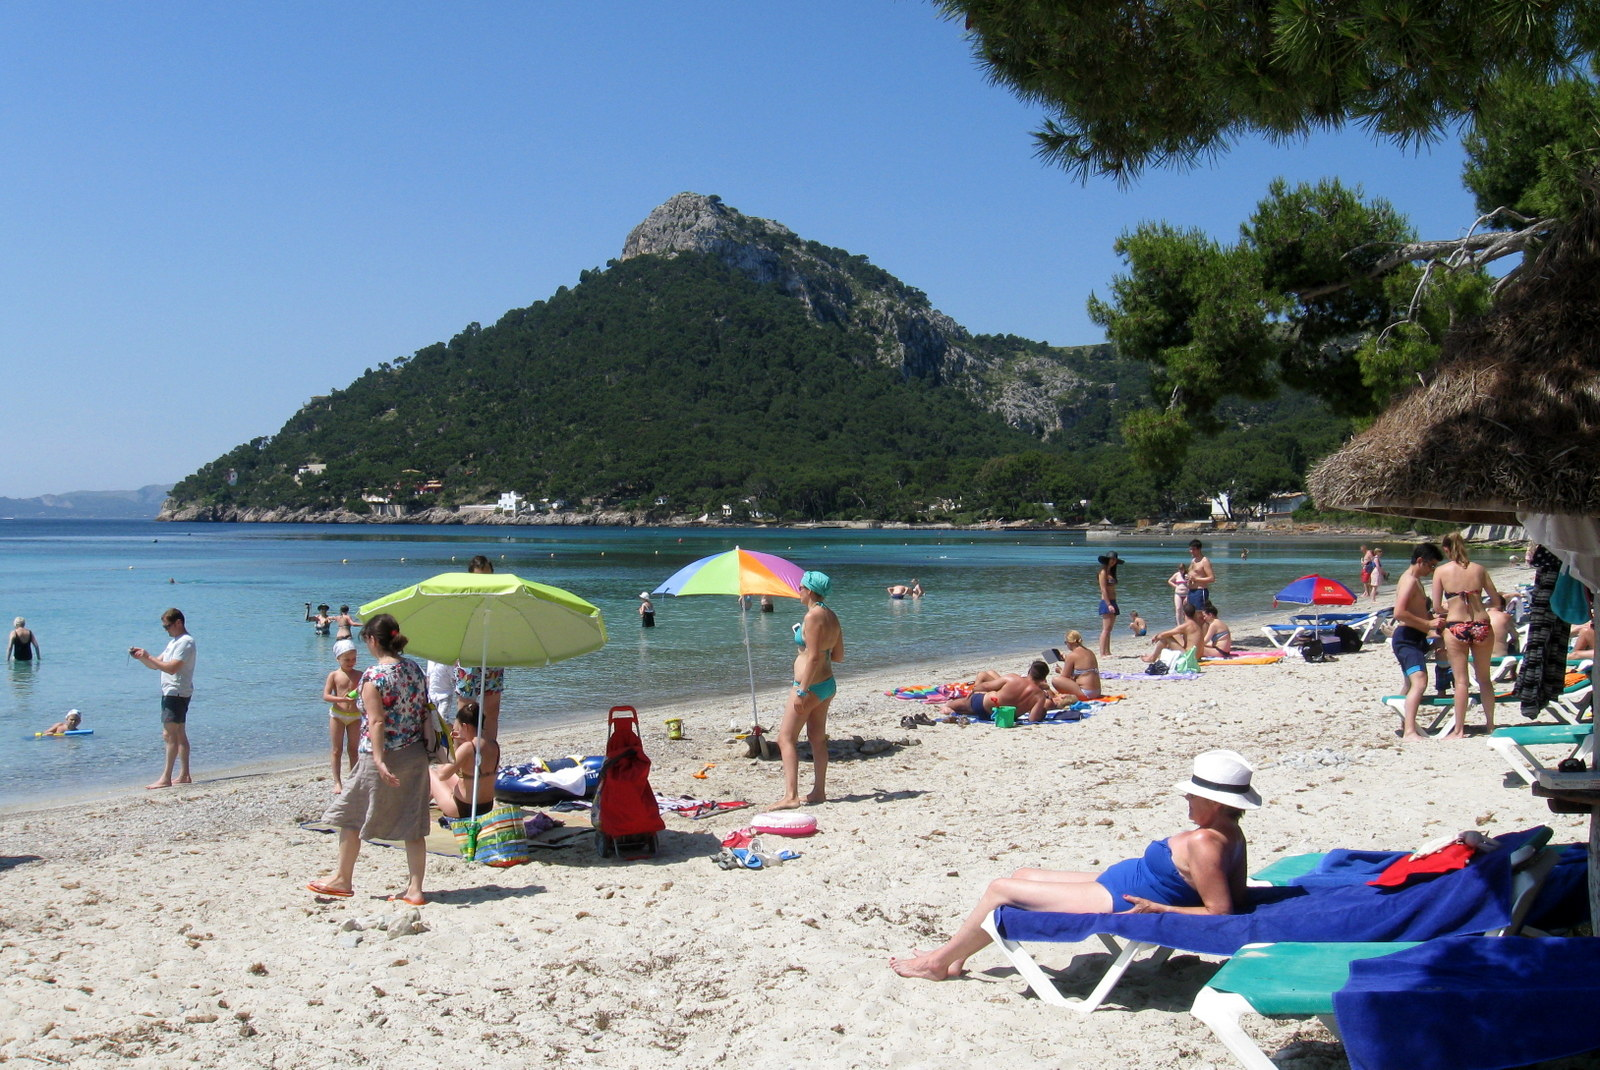 Nude Beaches In Spain Pics